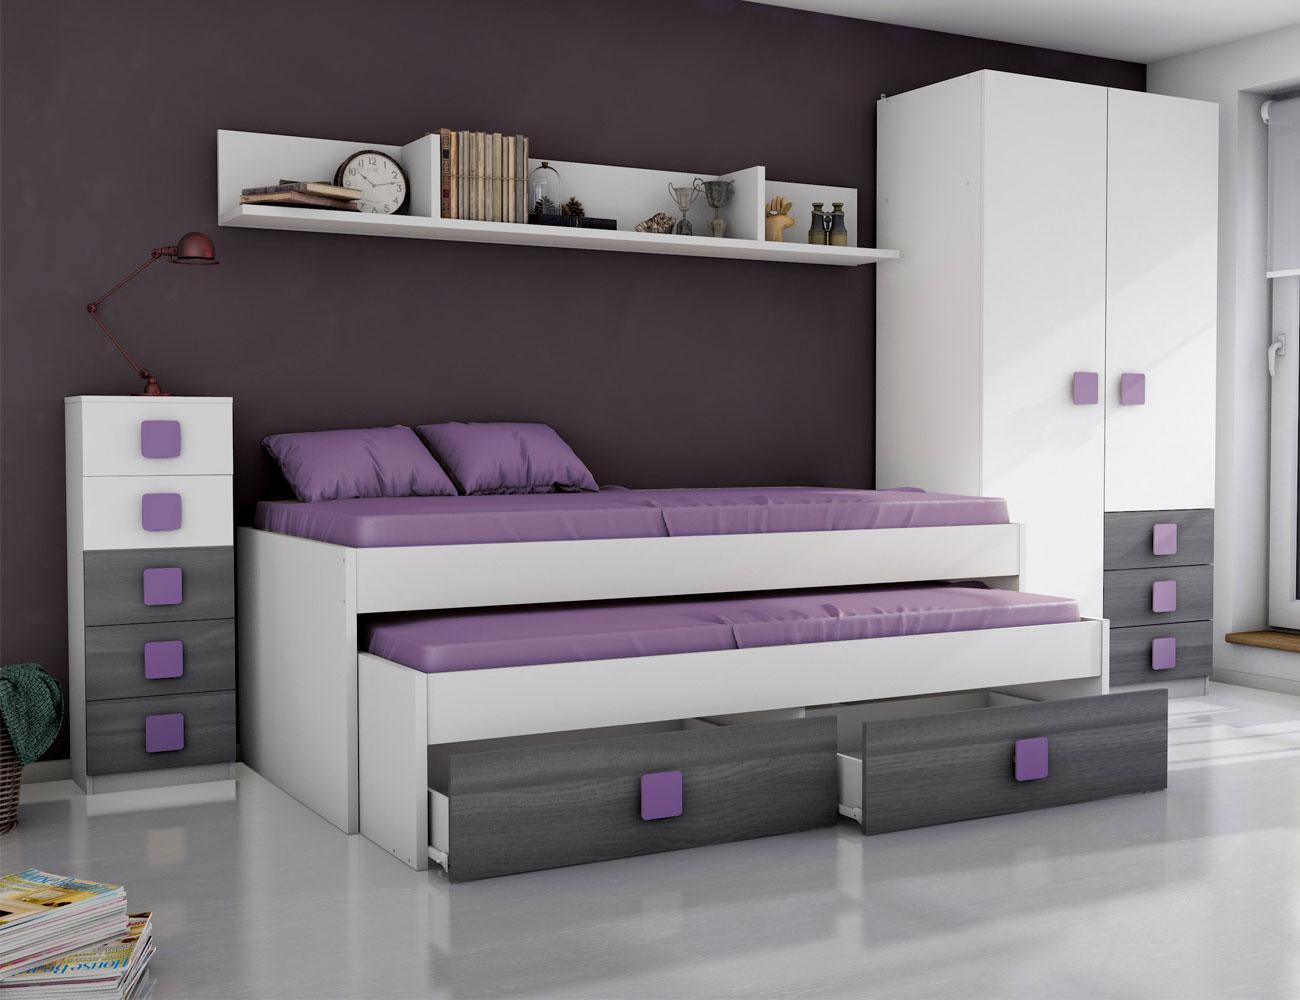 Dormitorio juvenil ceniza azul2